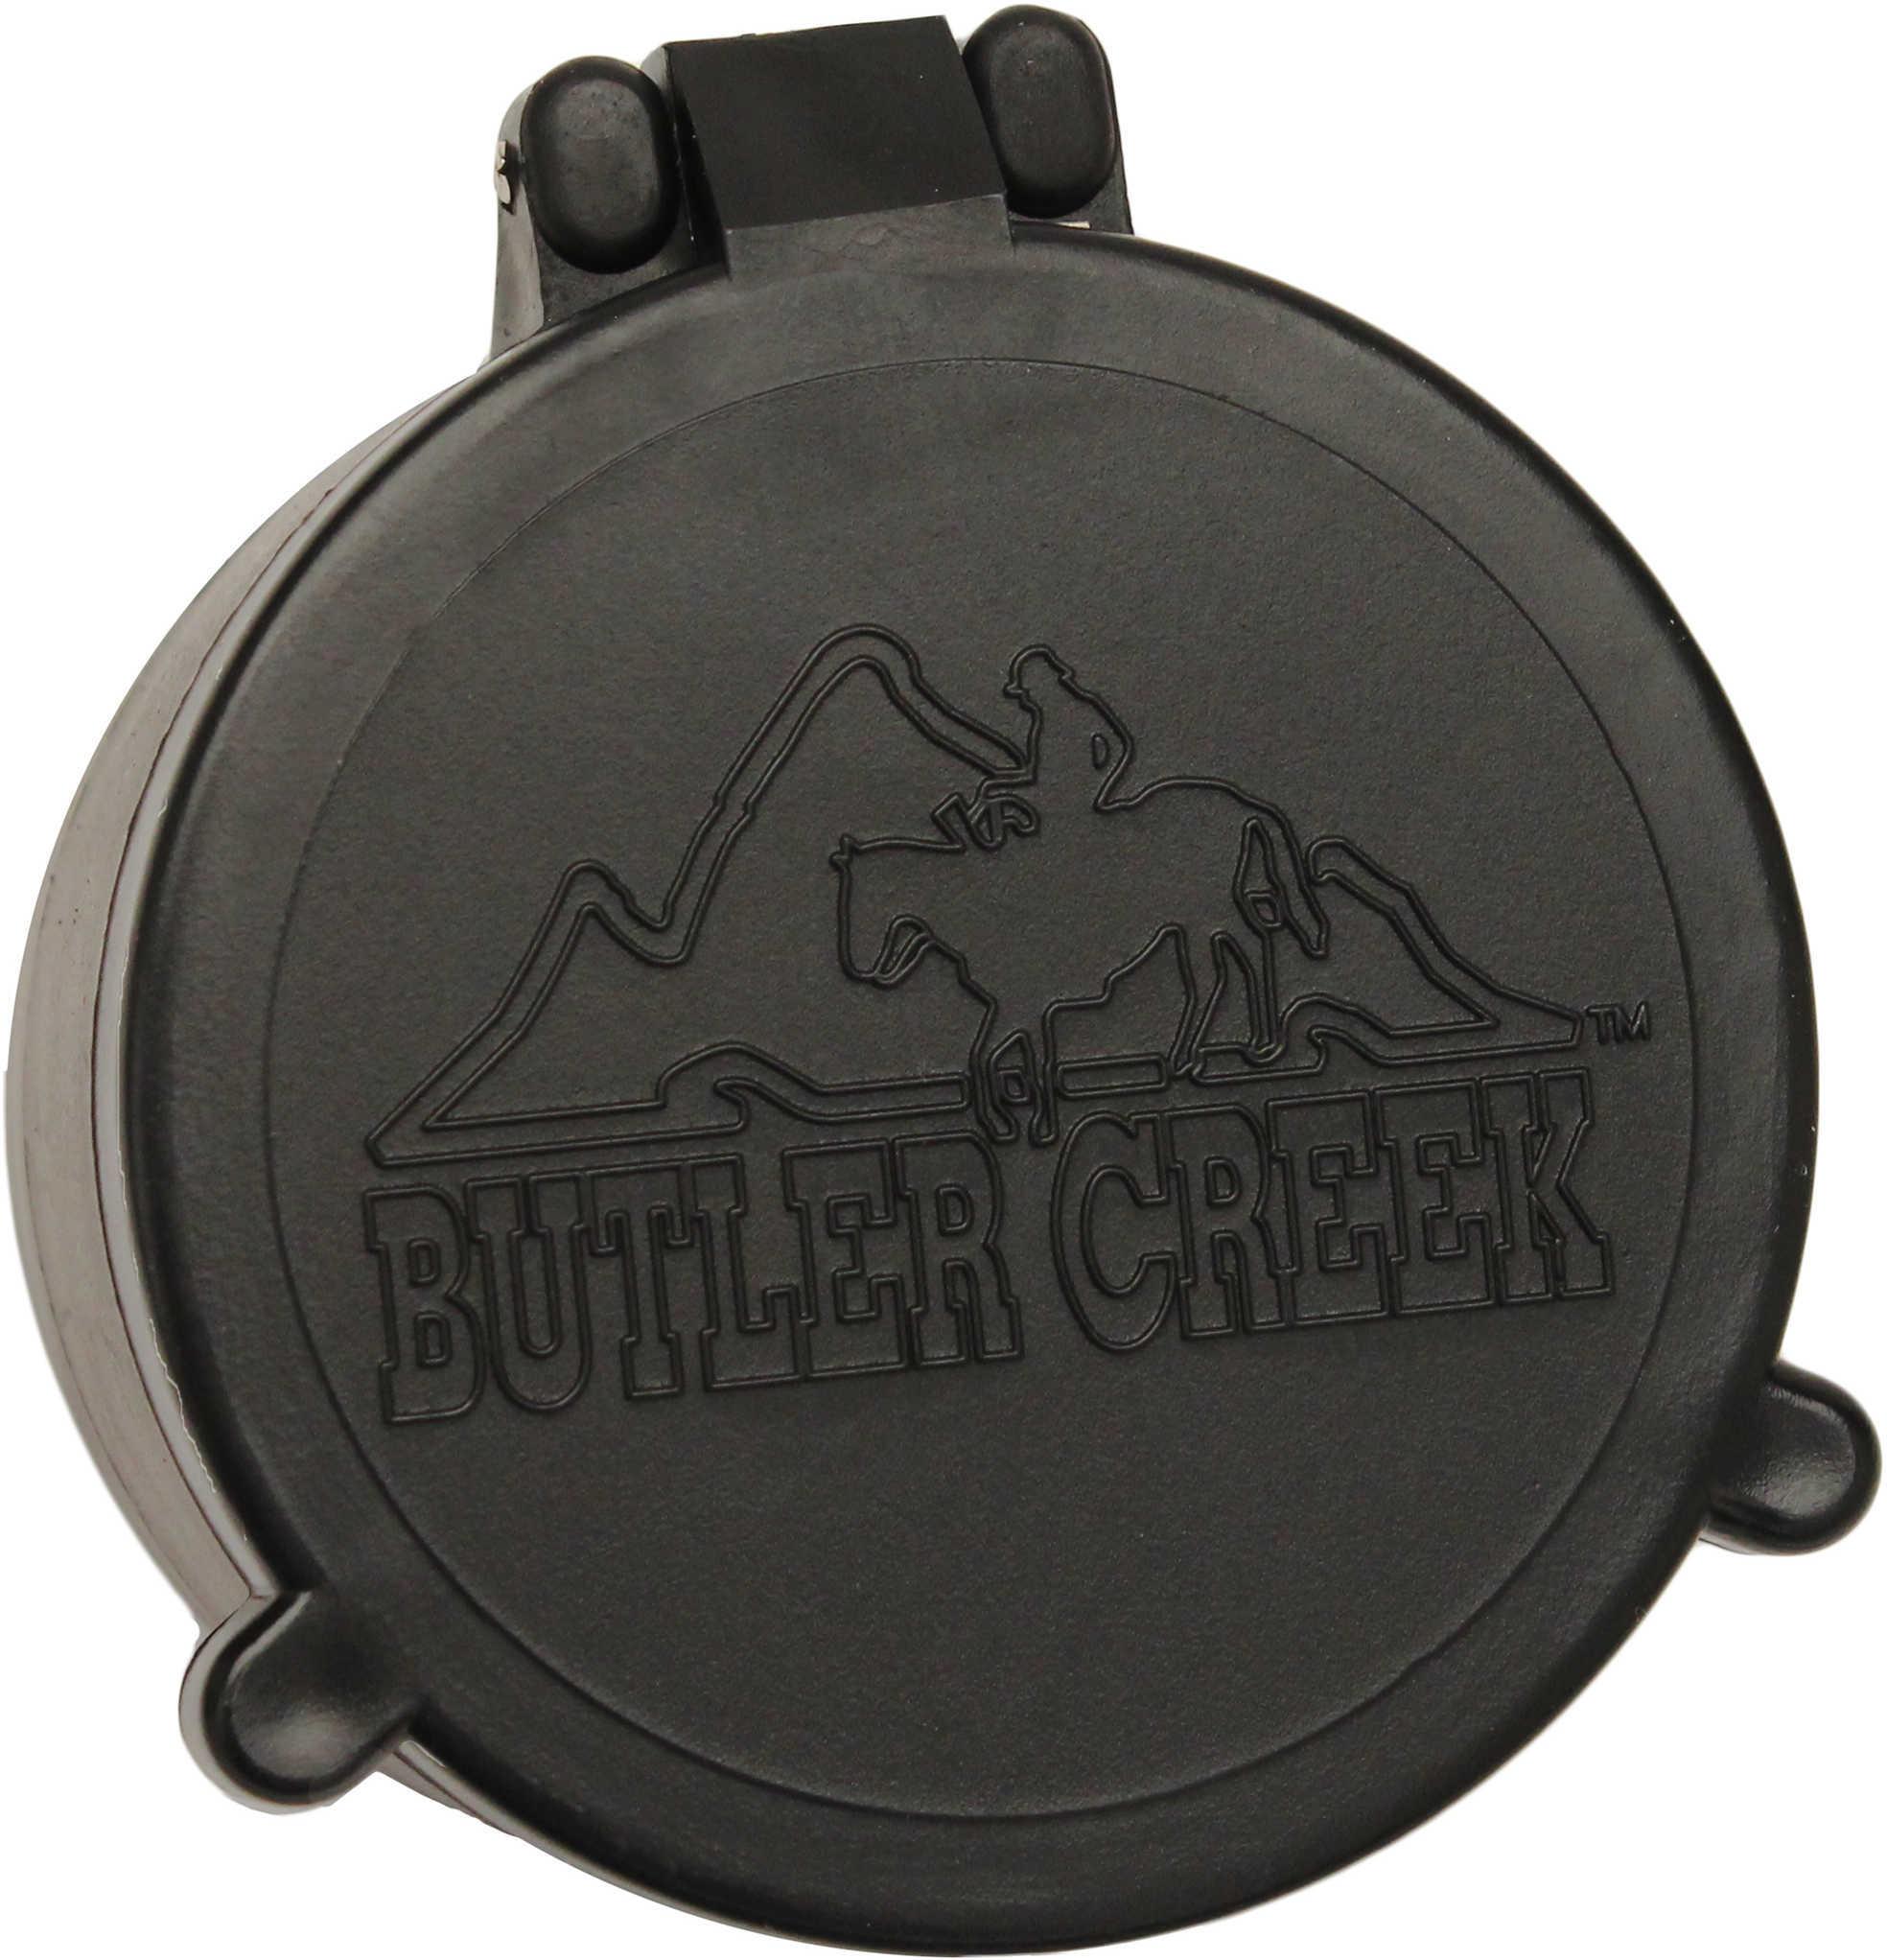 Butler Creek Flip Open Scope Cover - Objective Size 31 Md: 30310